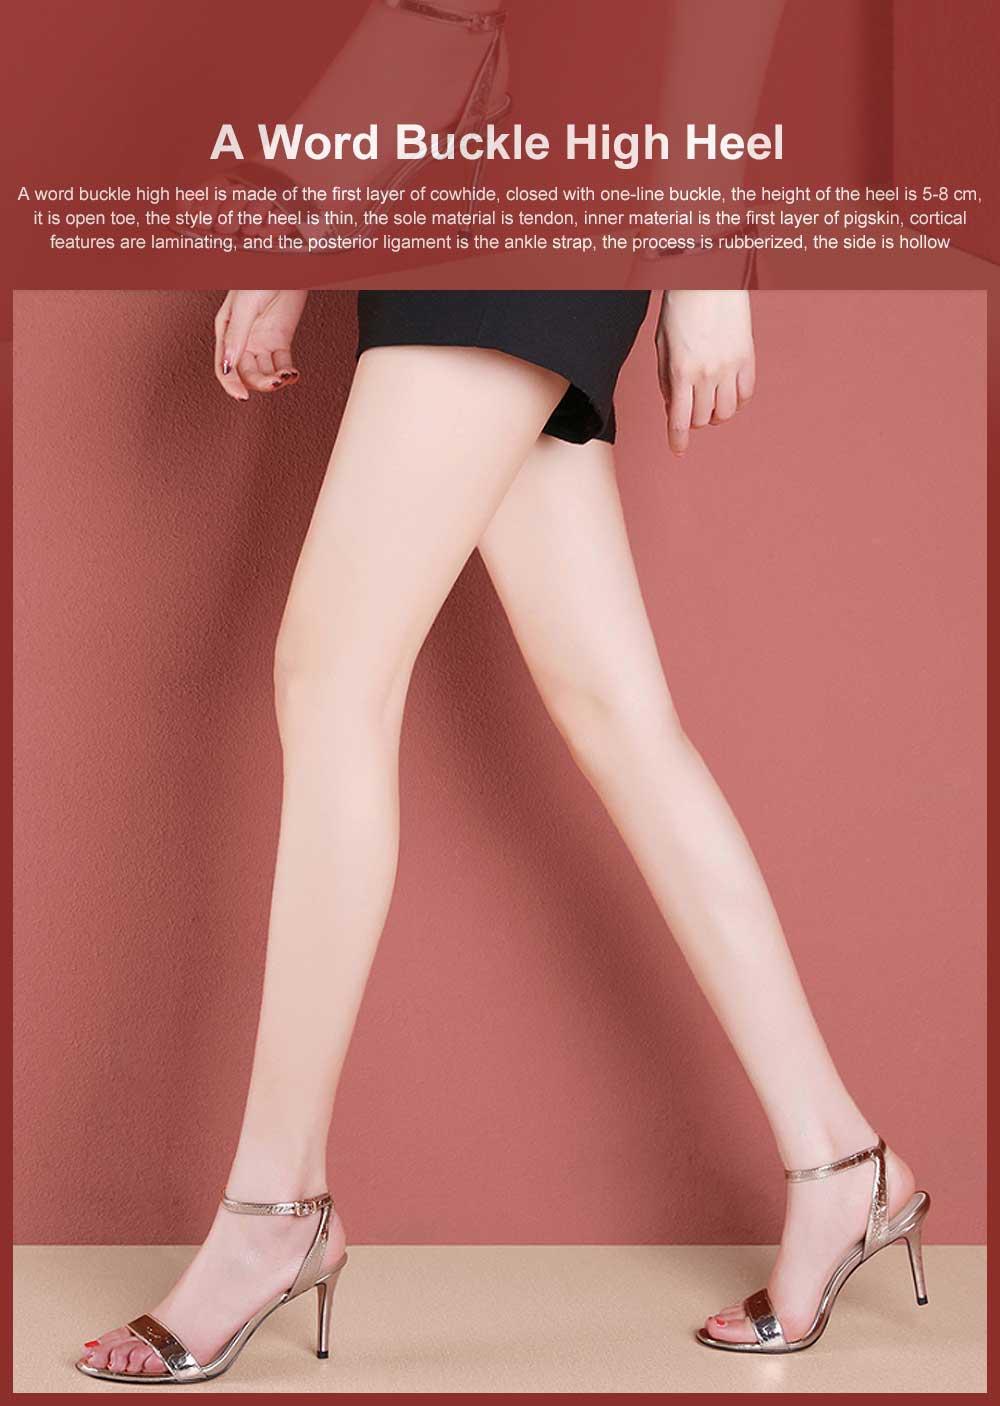 Summer High Heel Sandals with Word Buckle Roman Sandals, Women Dress Shoes Sexy High Heels 0